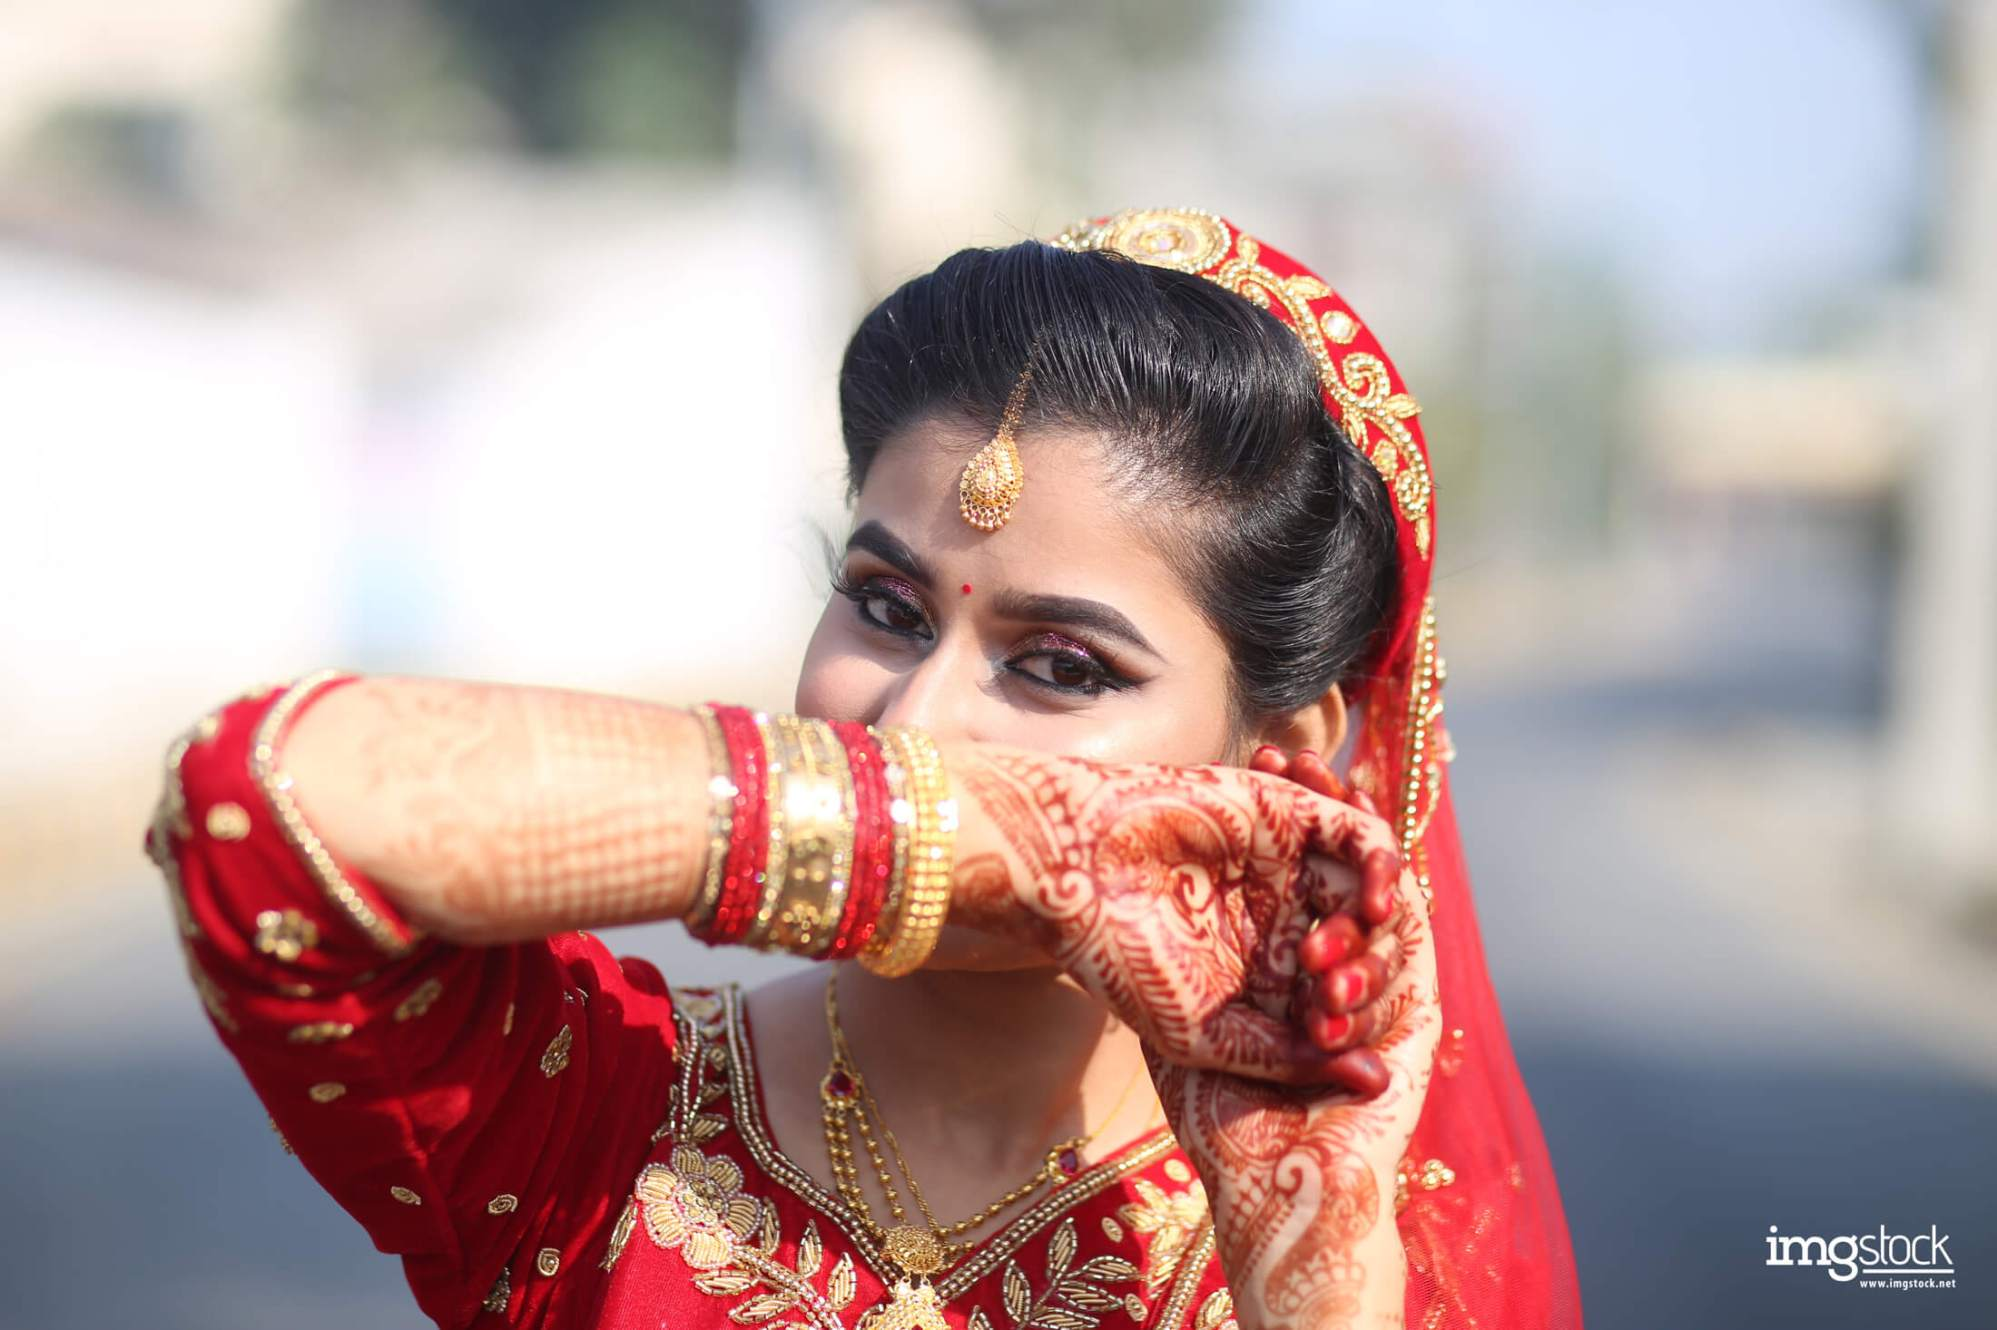 Swikriti Gautam - Bridal Photoshoot, Imgstock